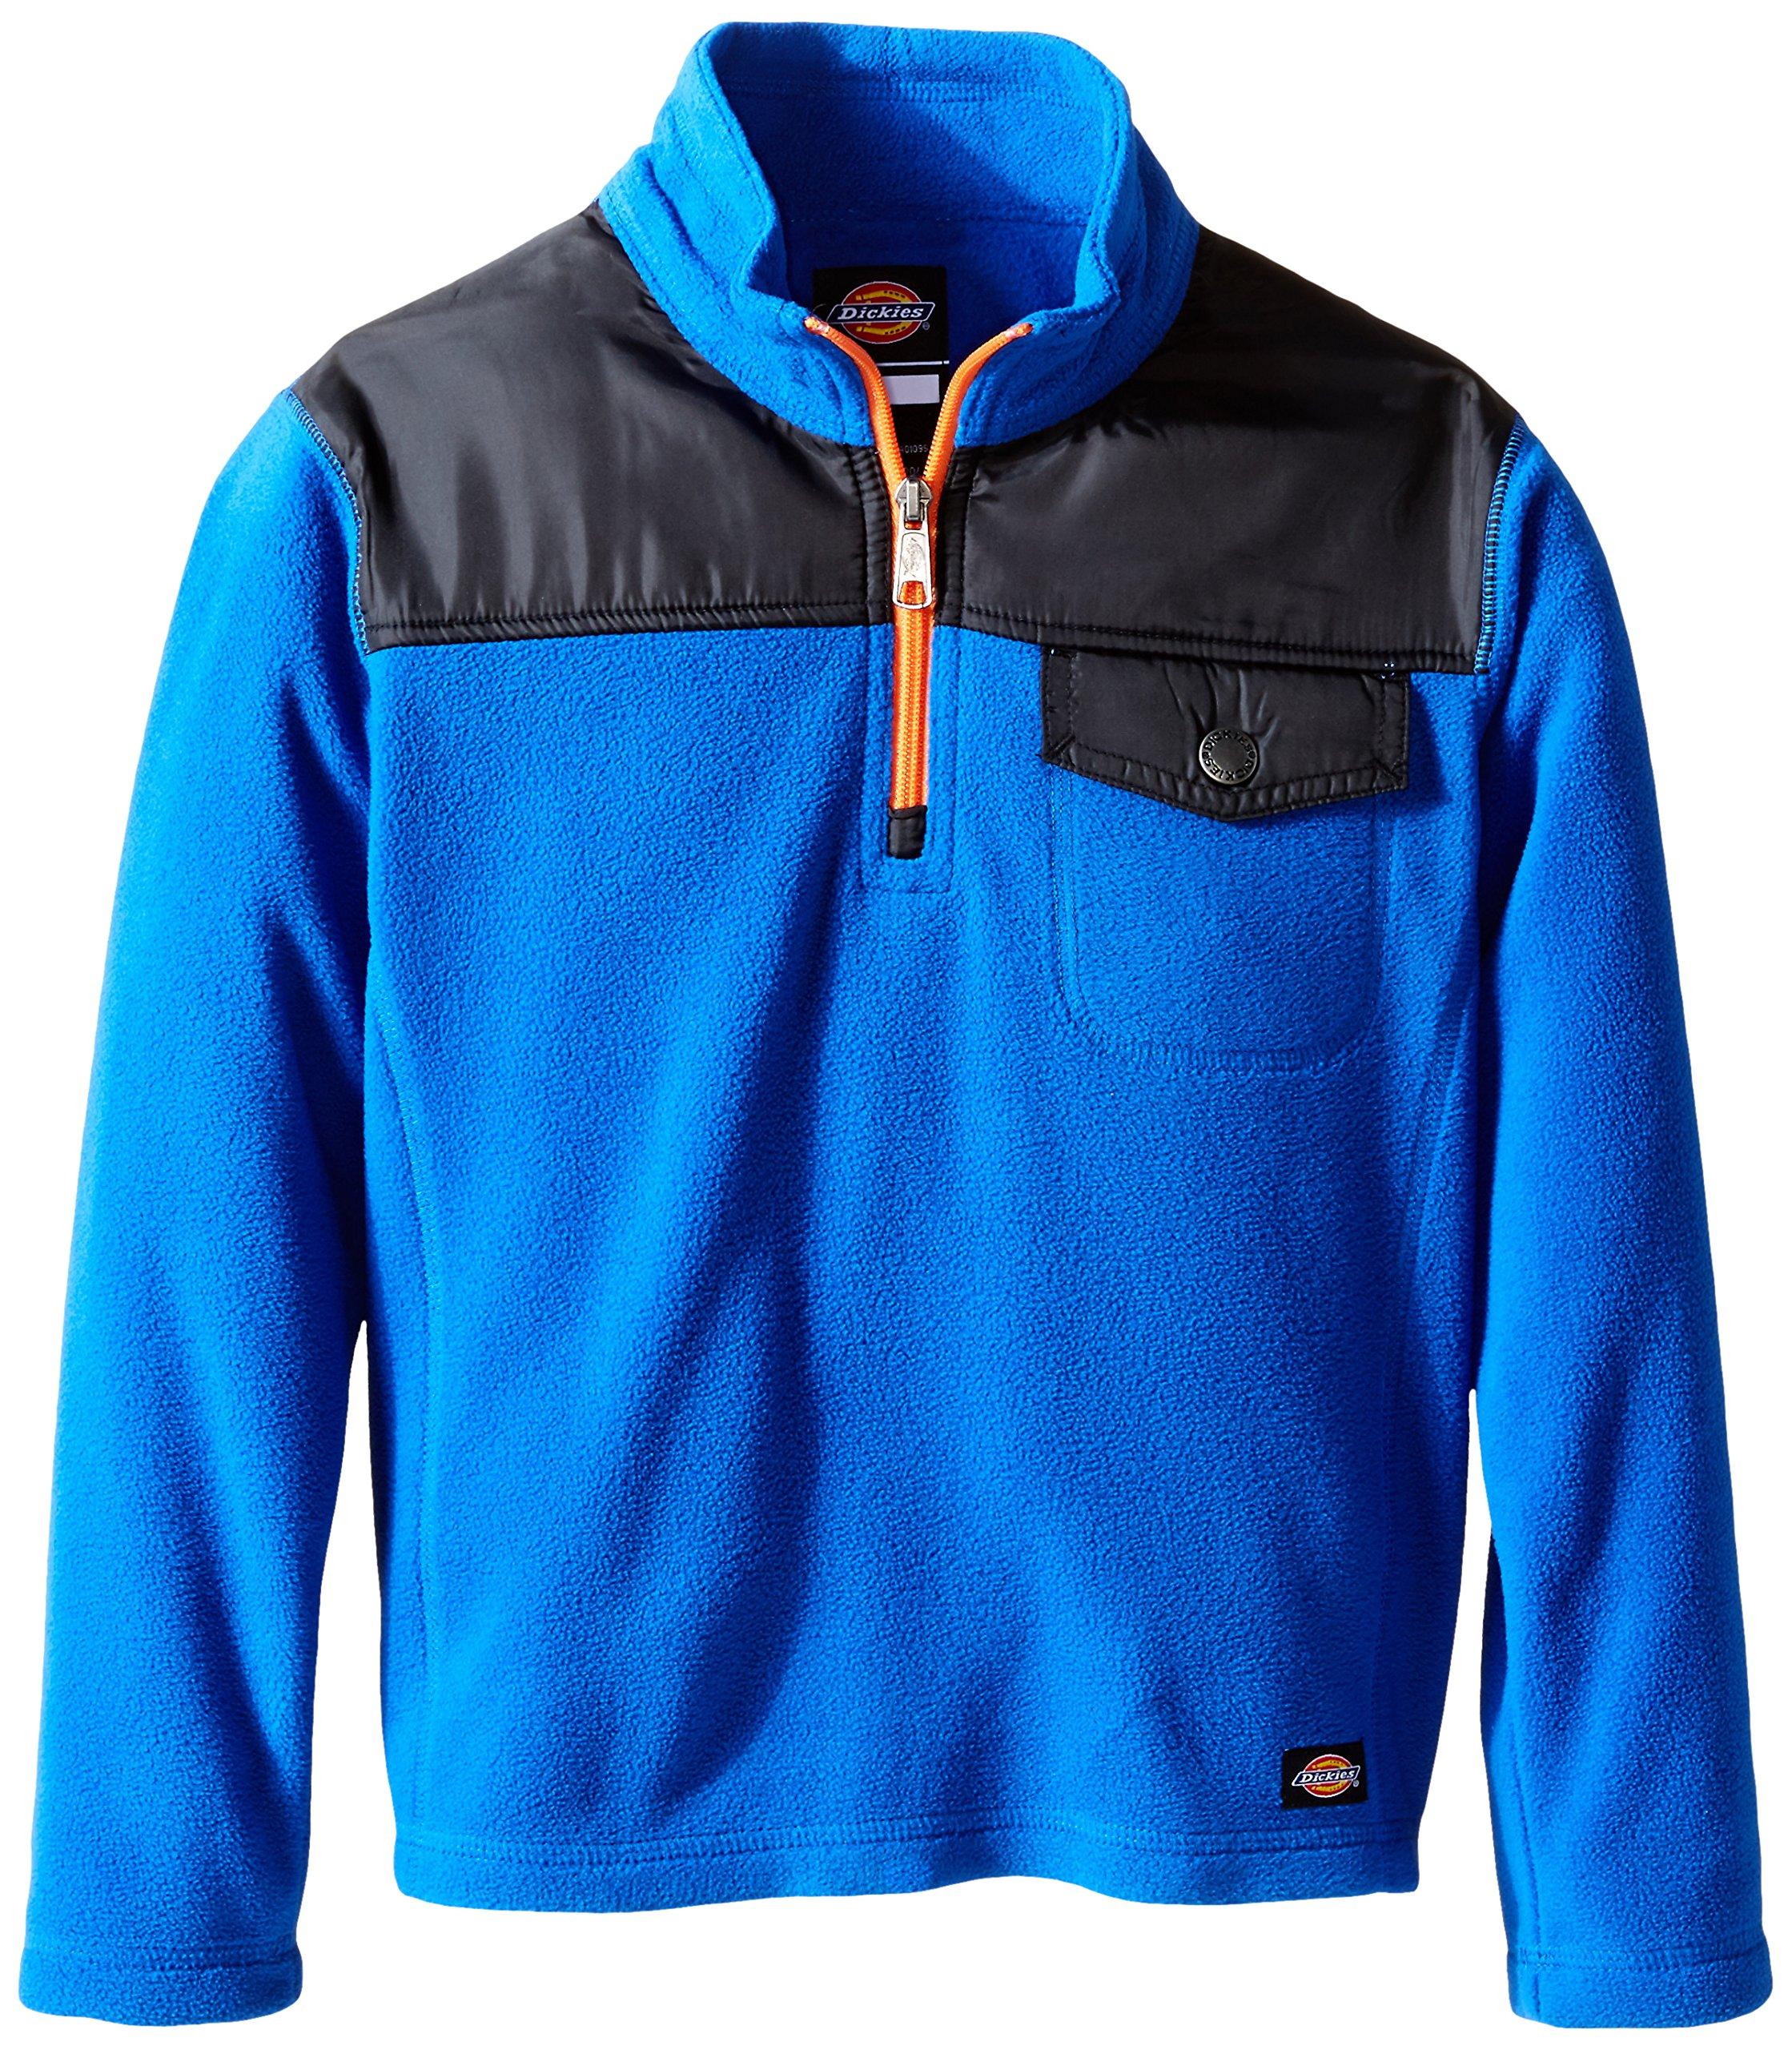 Dickies Big Boys' Quarter Zip Performance Fleece Jacket, Royal Blue, X-Large (18/20)